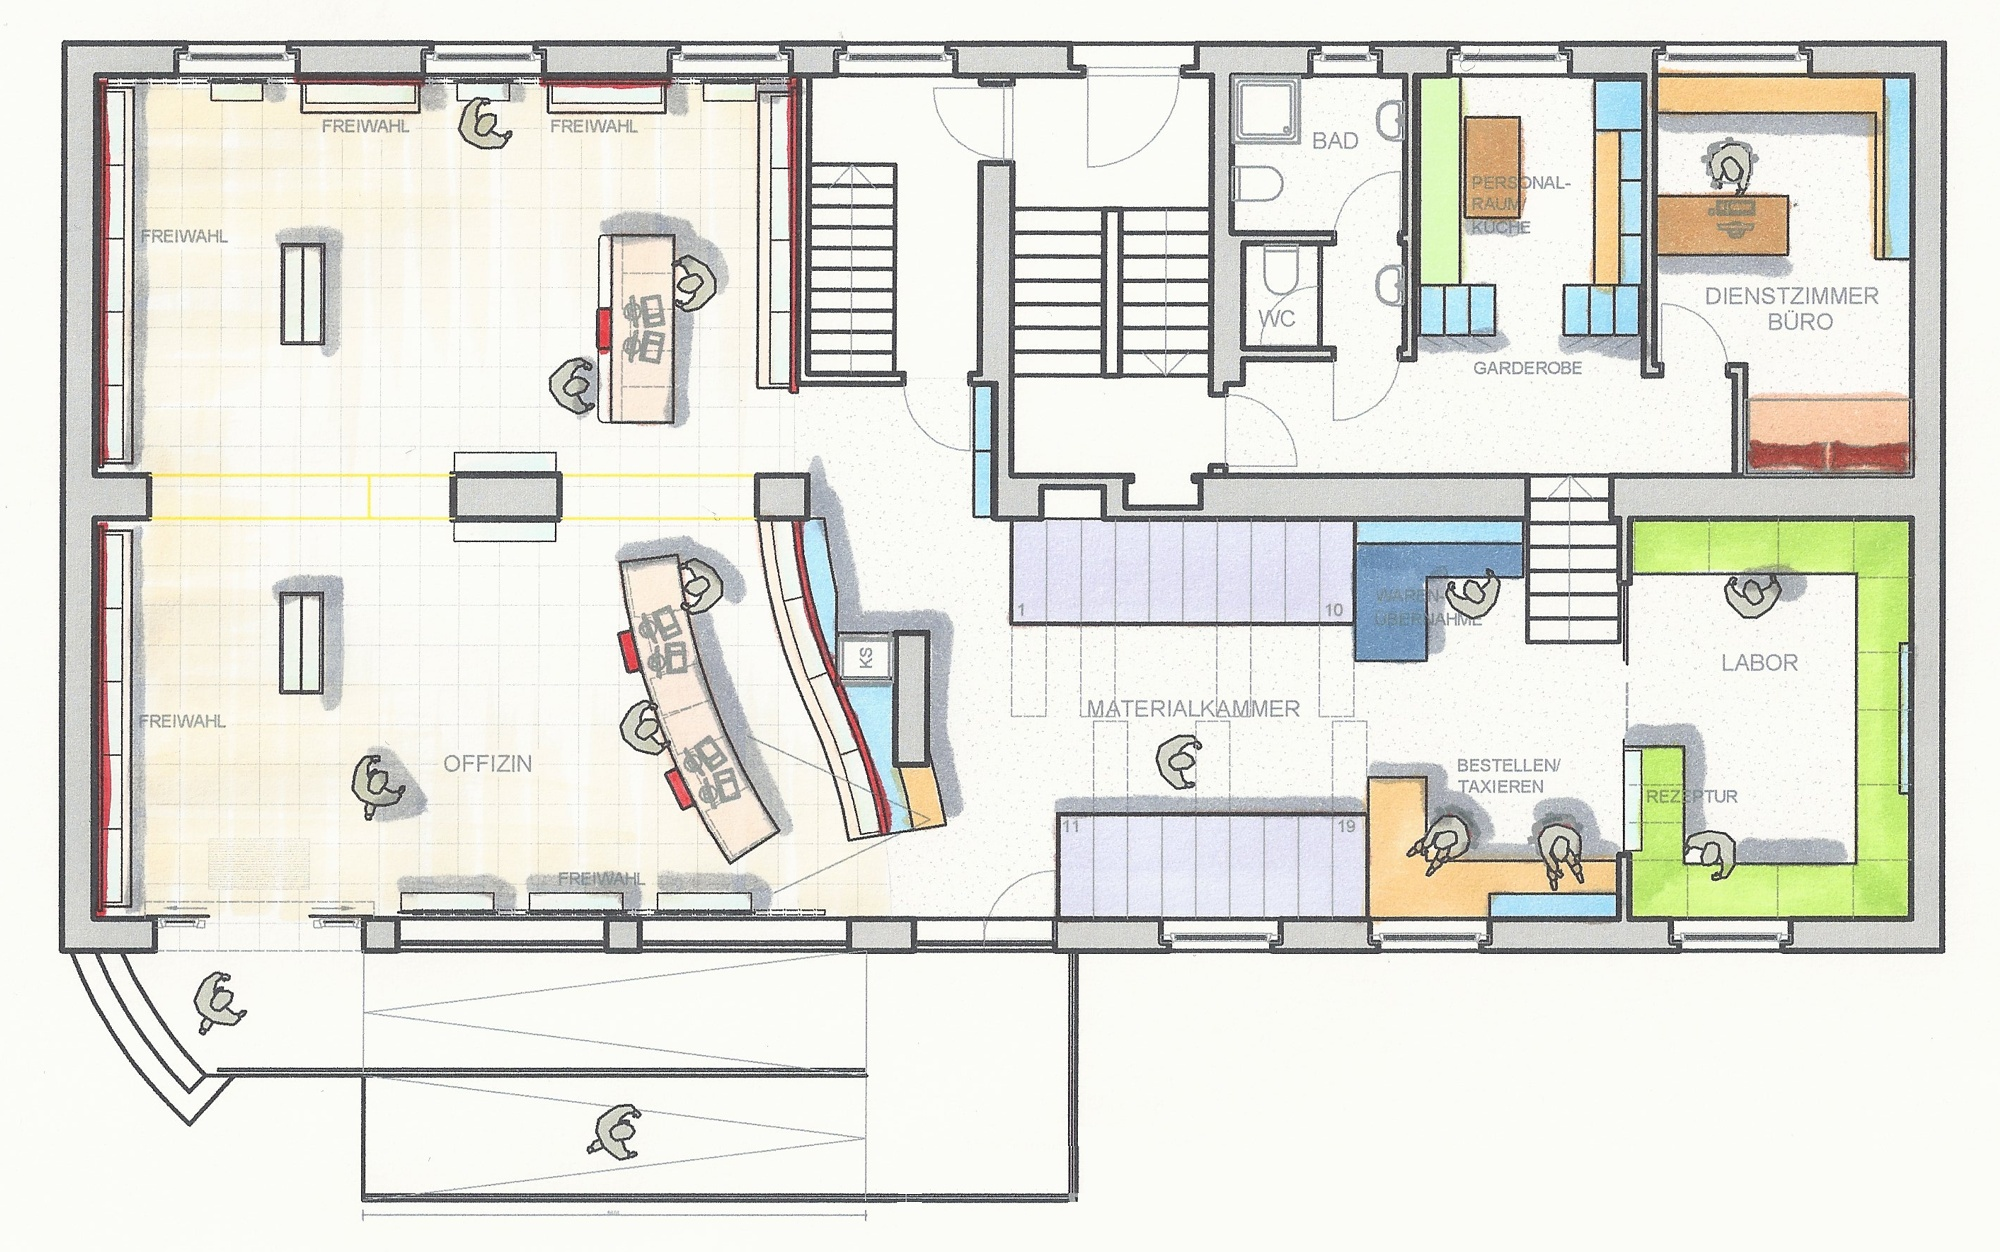 Planungsphase Ii Visualisierung Klinger Apothenkenbau